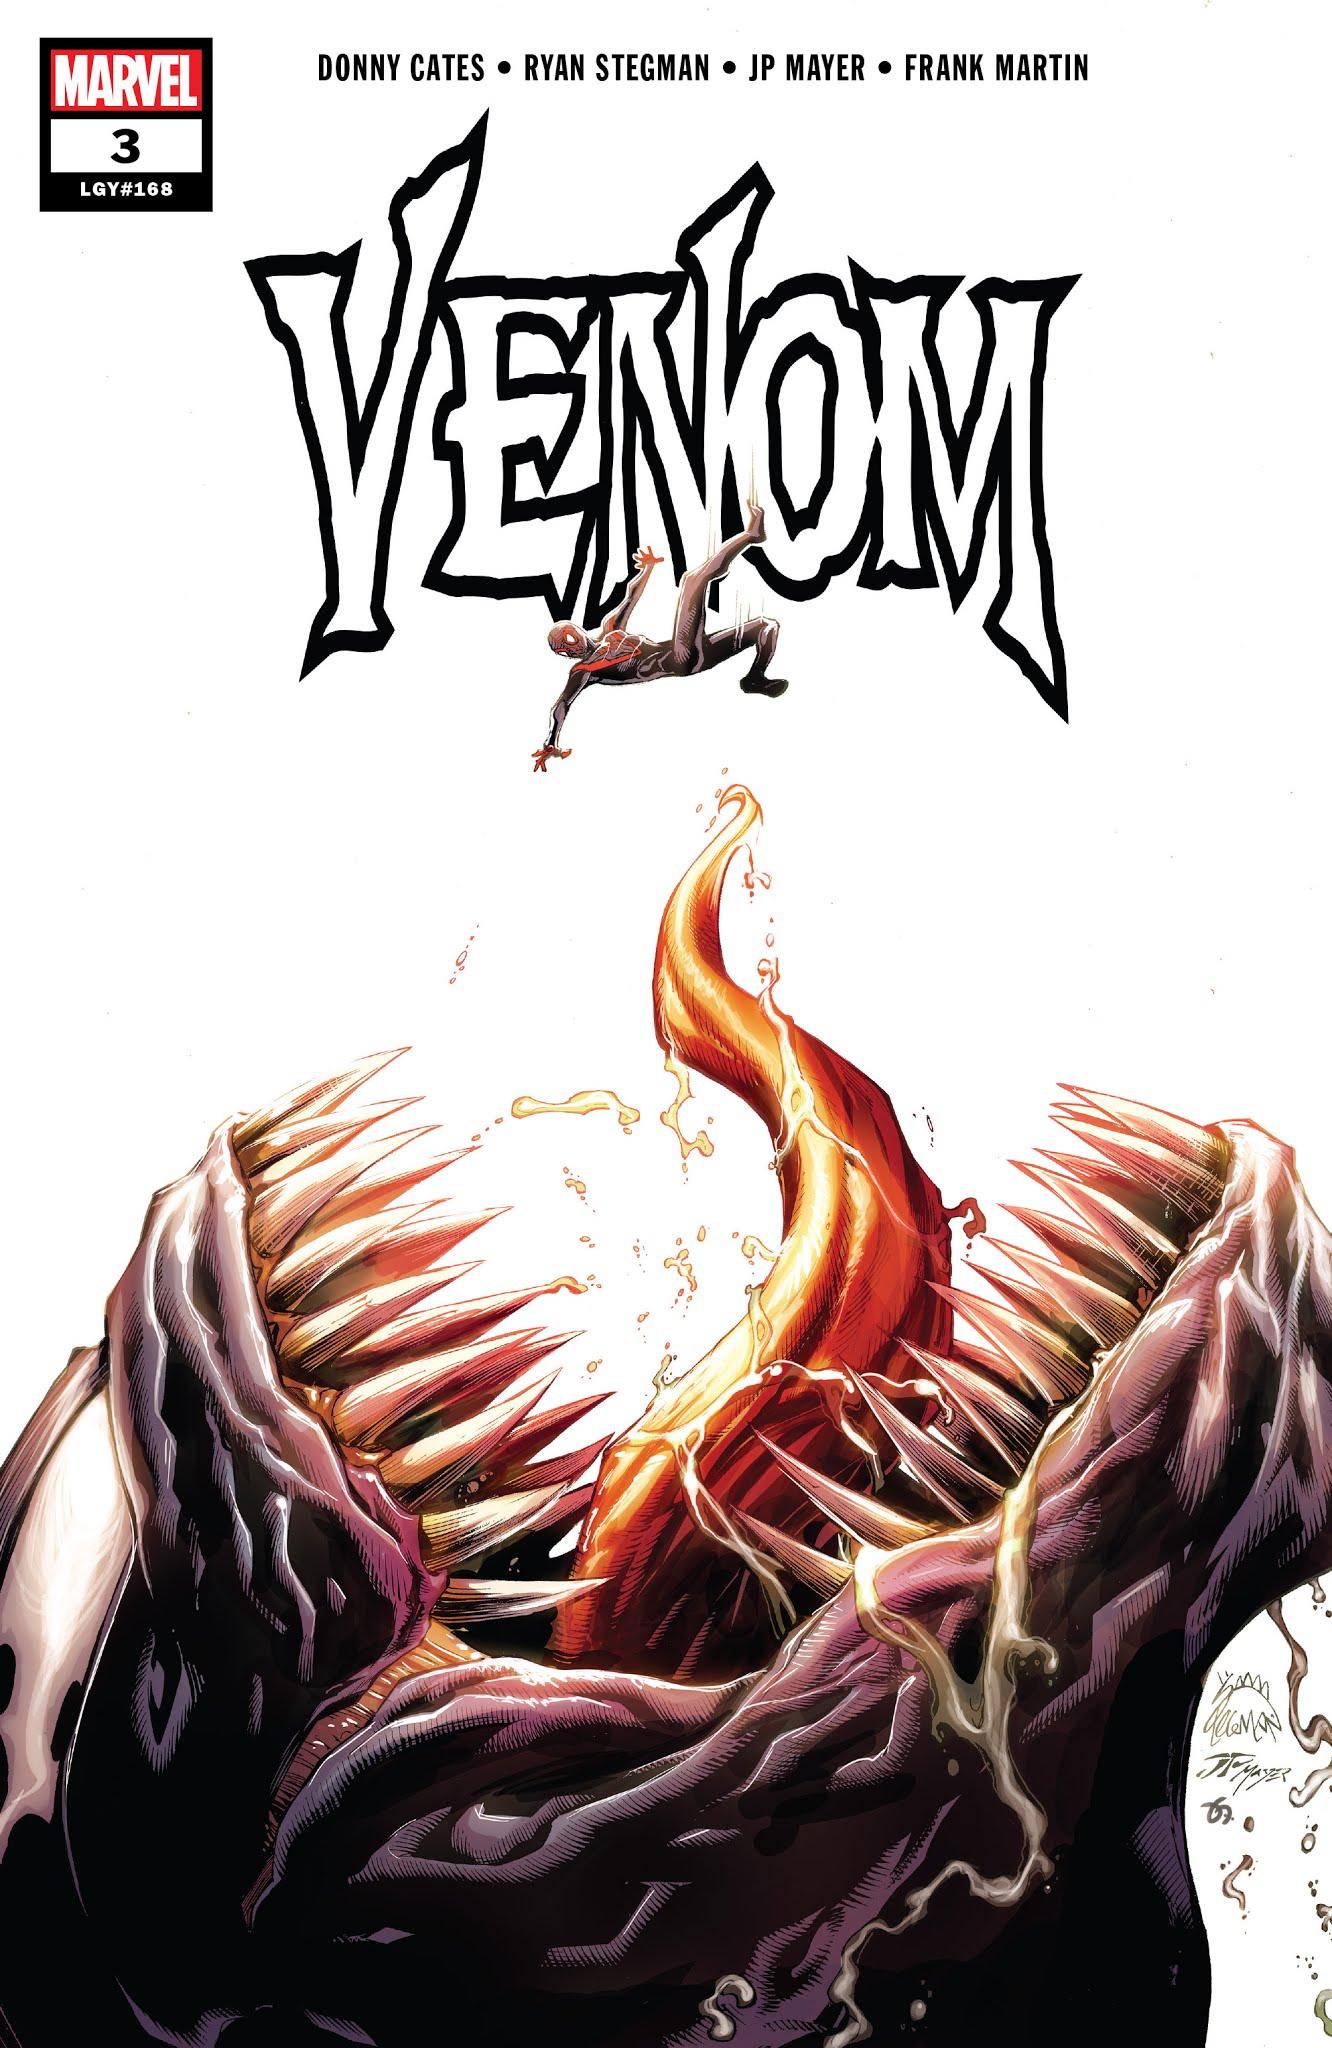 Venom (2018) 3 Page 1